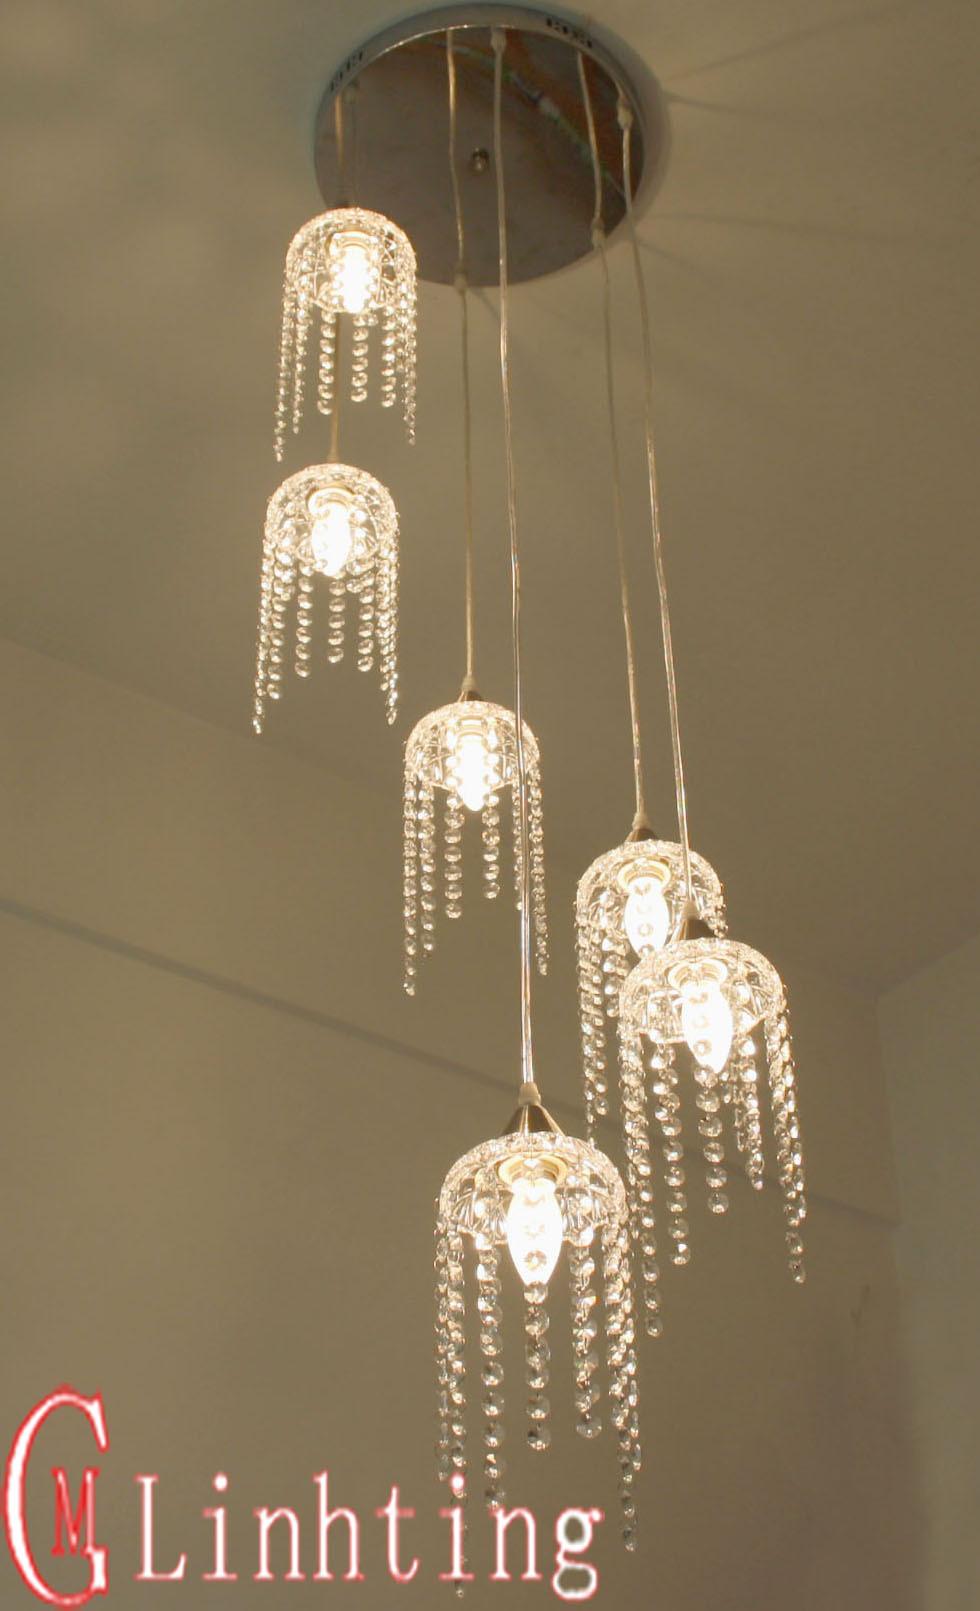 Led iron crystal lamp pendant light lamp wood stair lighting lamps lamp cover f365(China (Mainland))